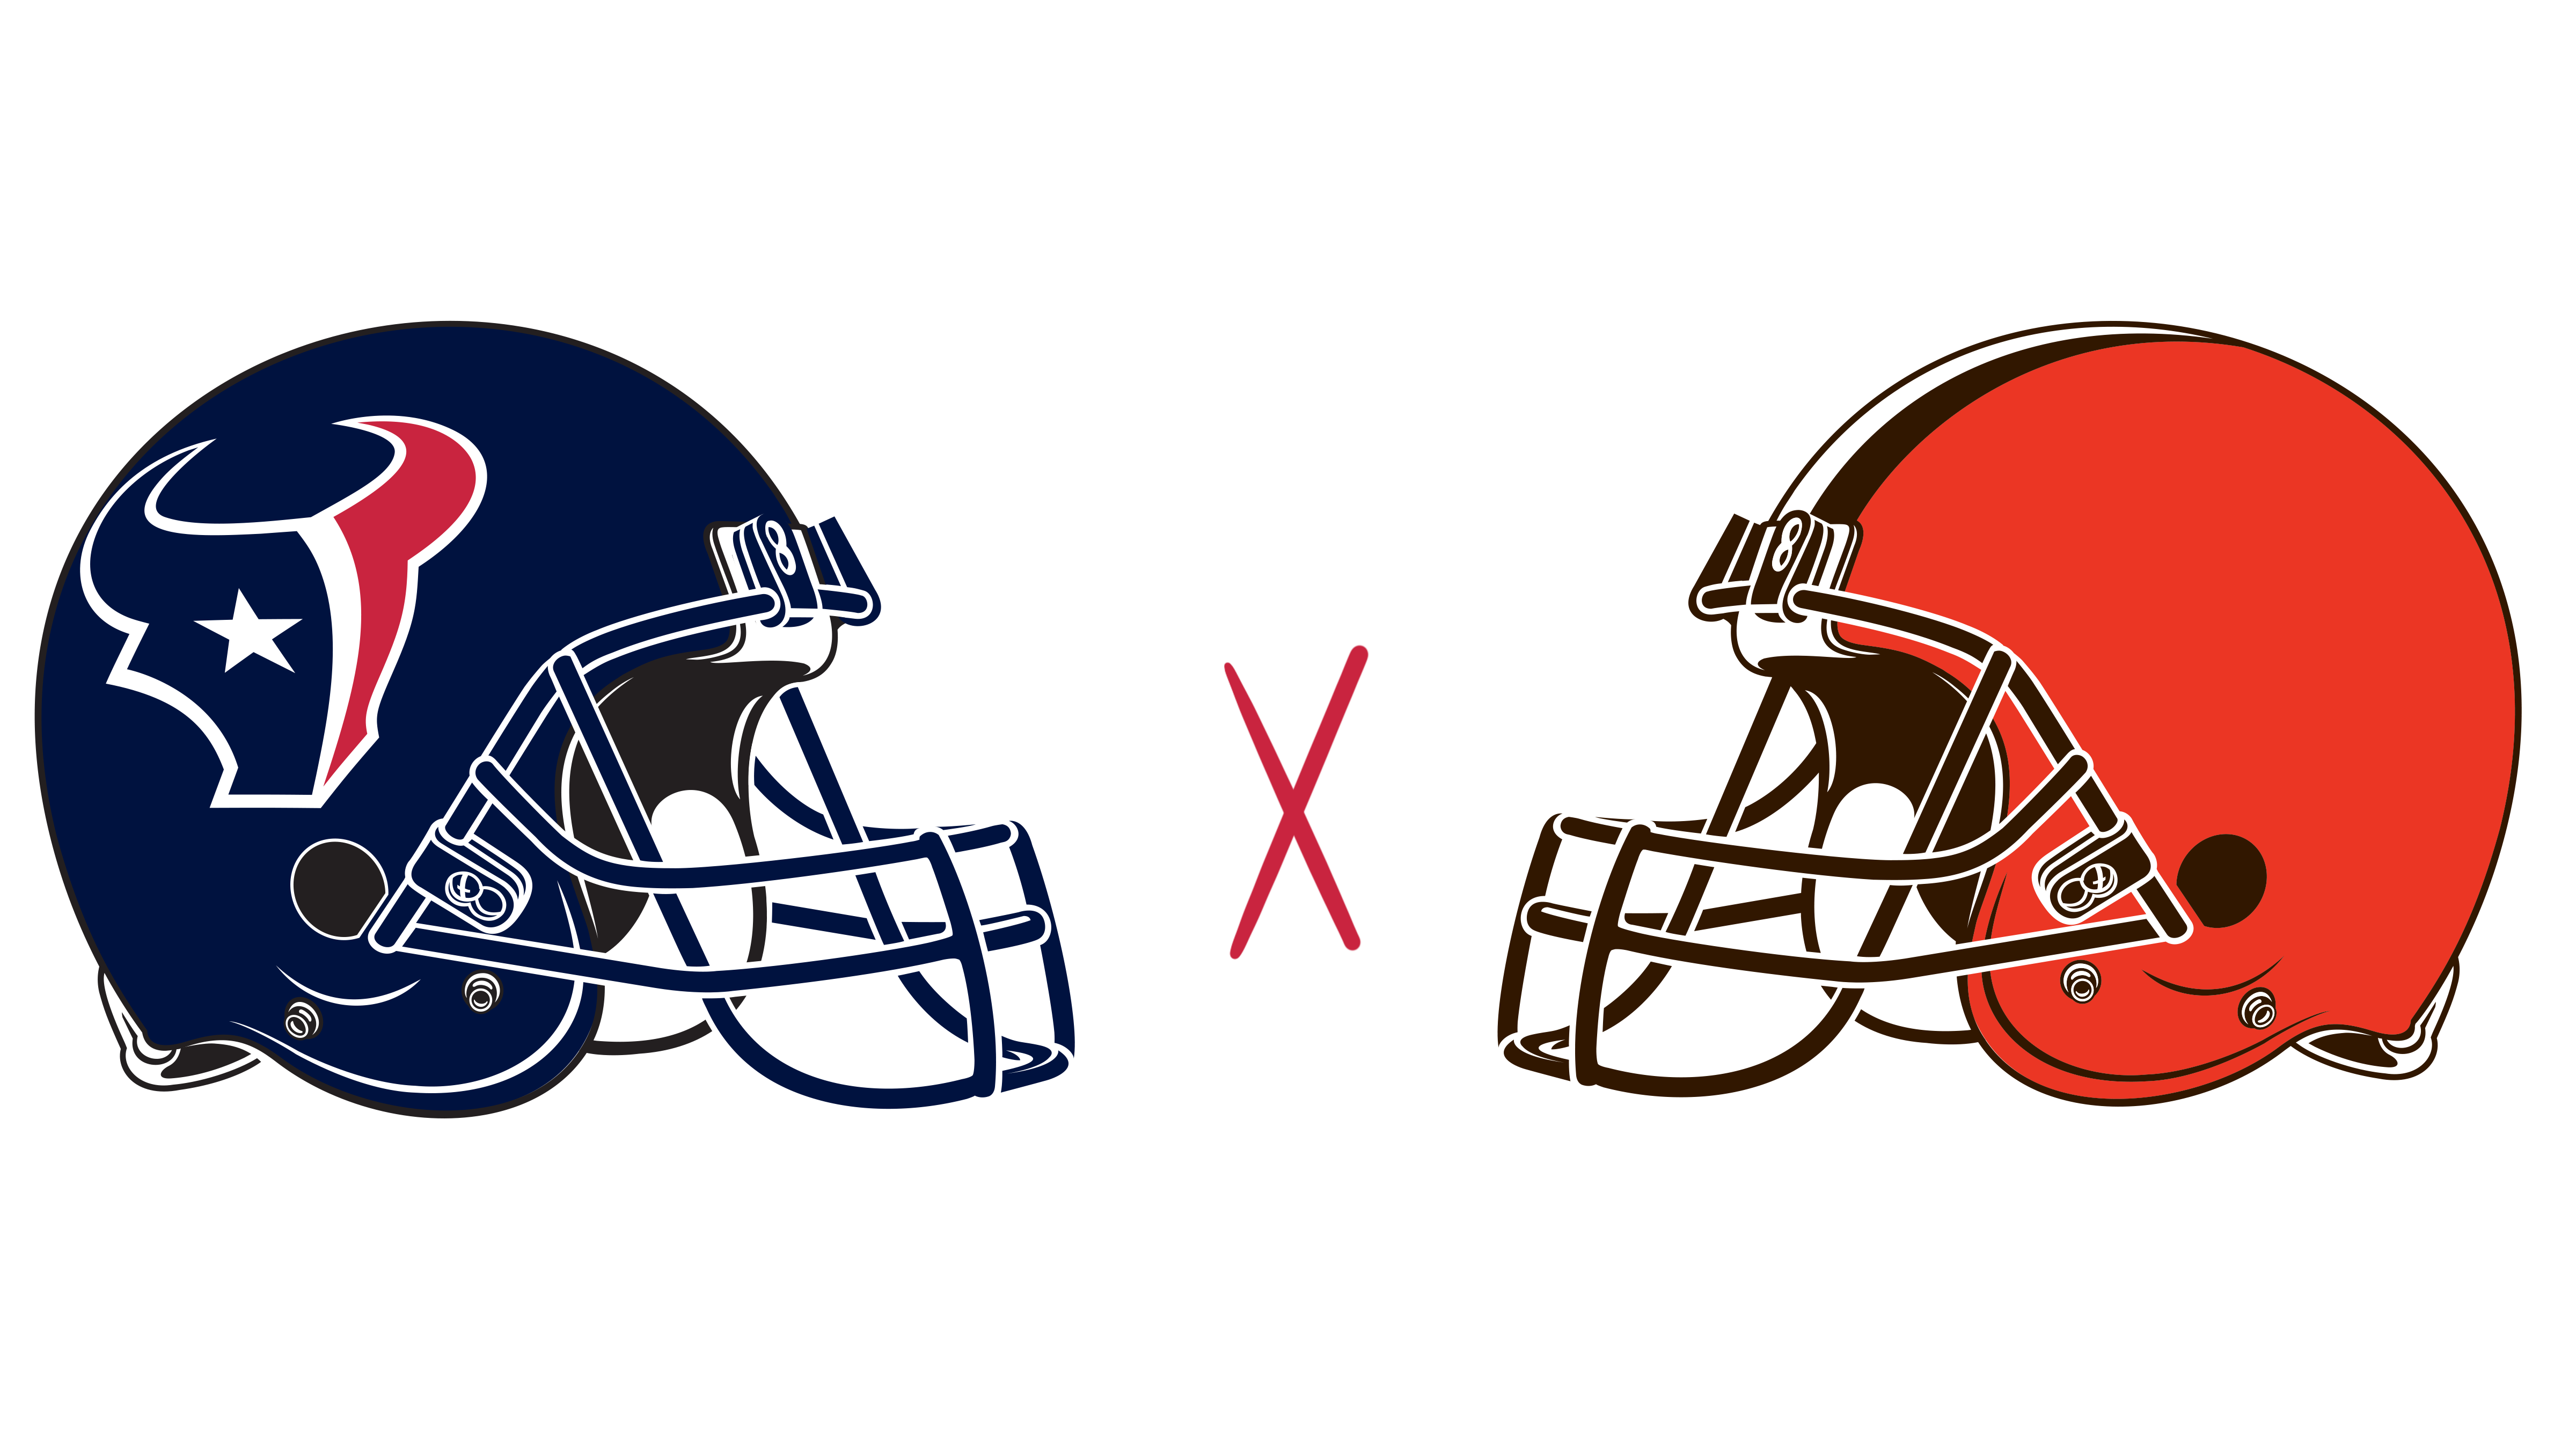 Houston Texans helmet and Cleveland Browns helmet